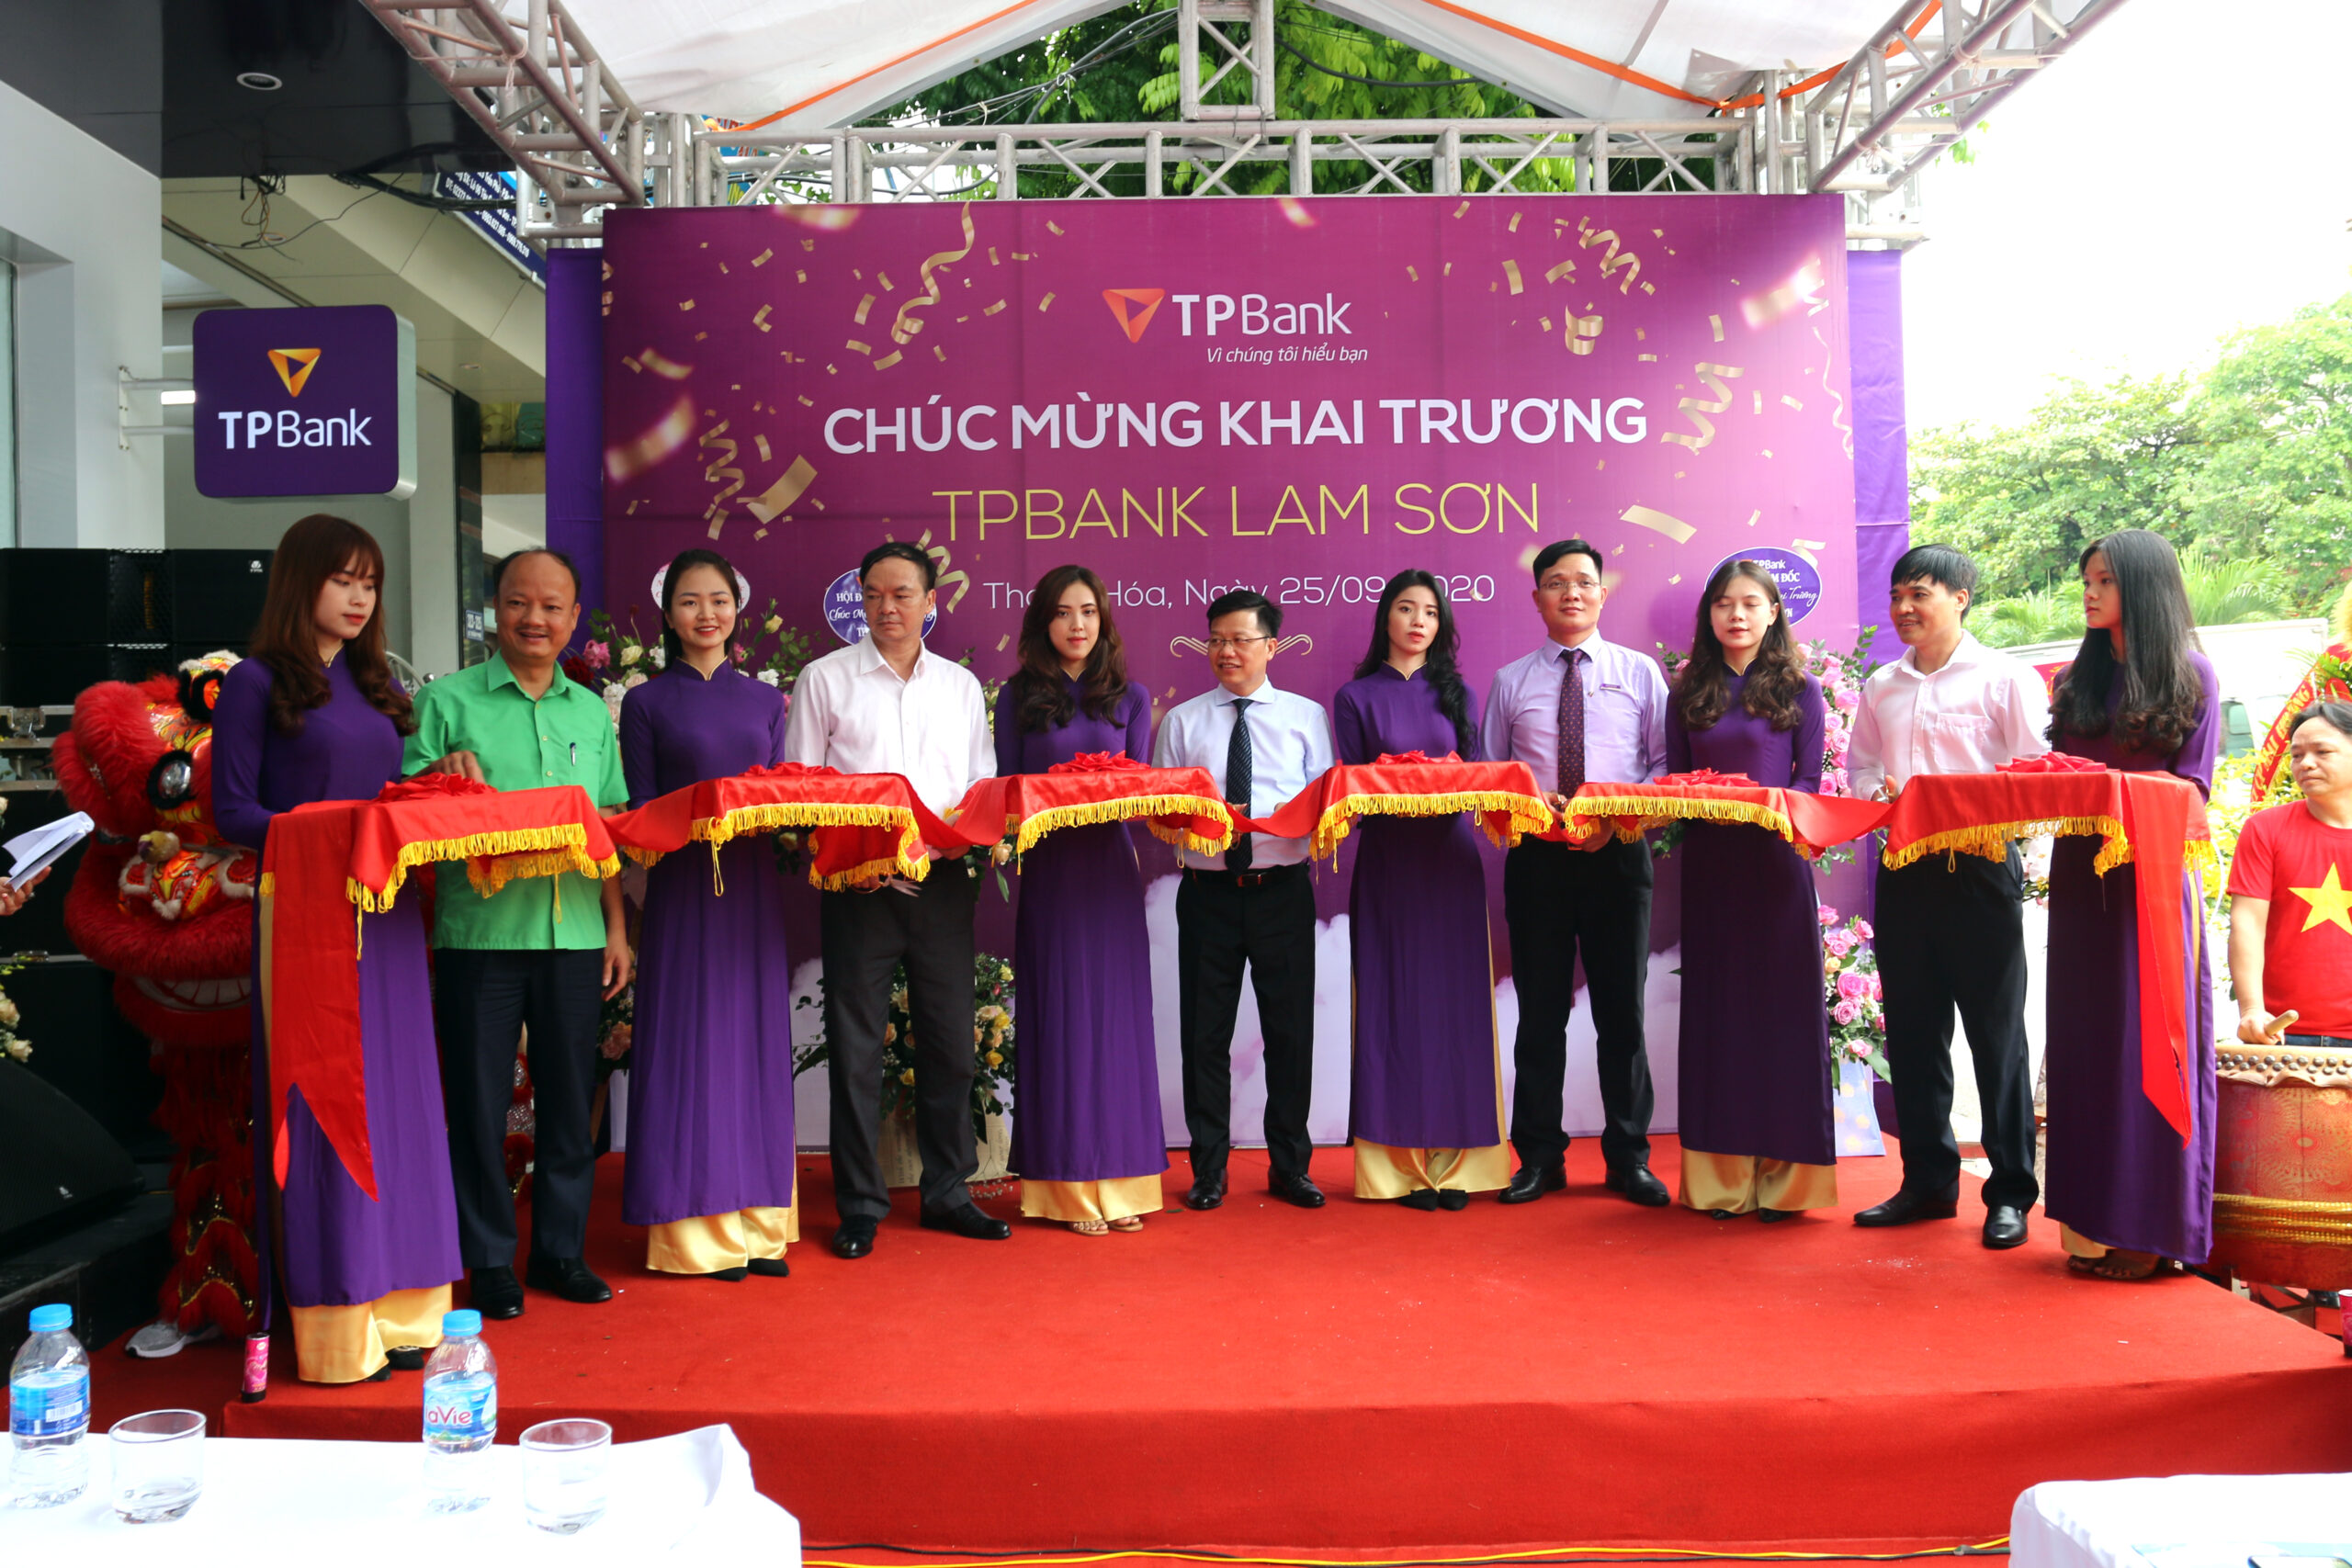 Lễ khai trương TPBANK LAM SƠN Thanh Hóa